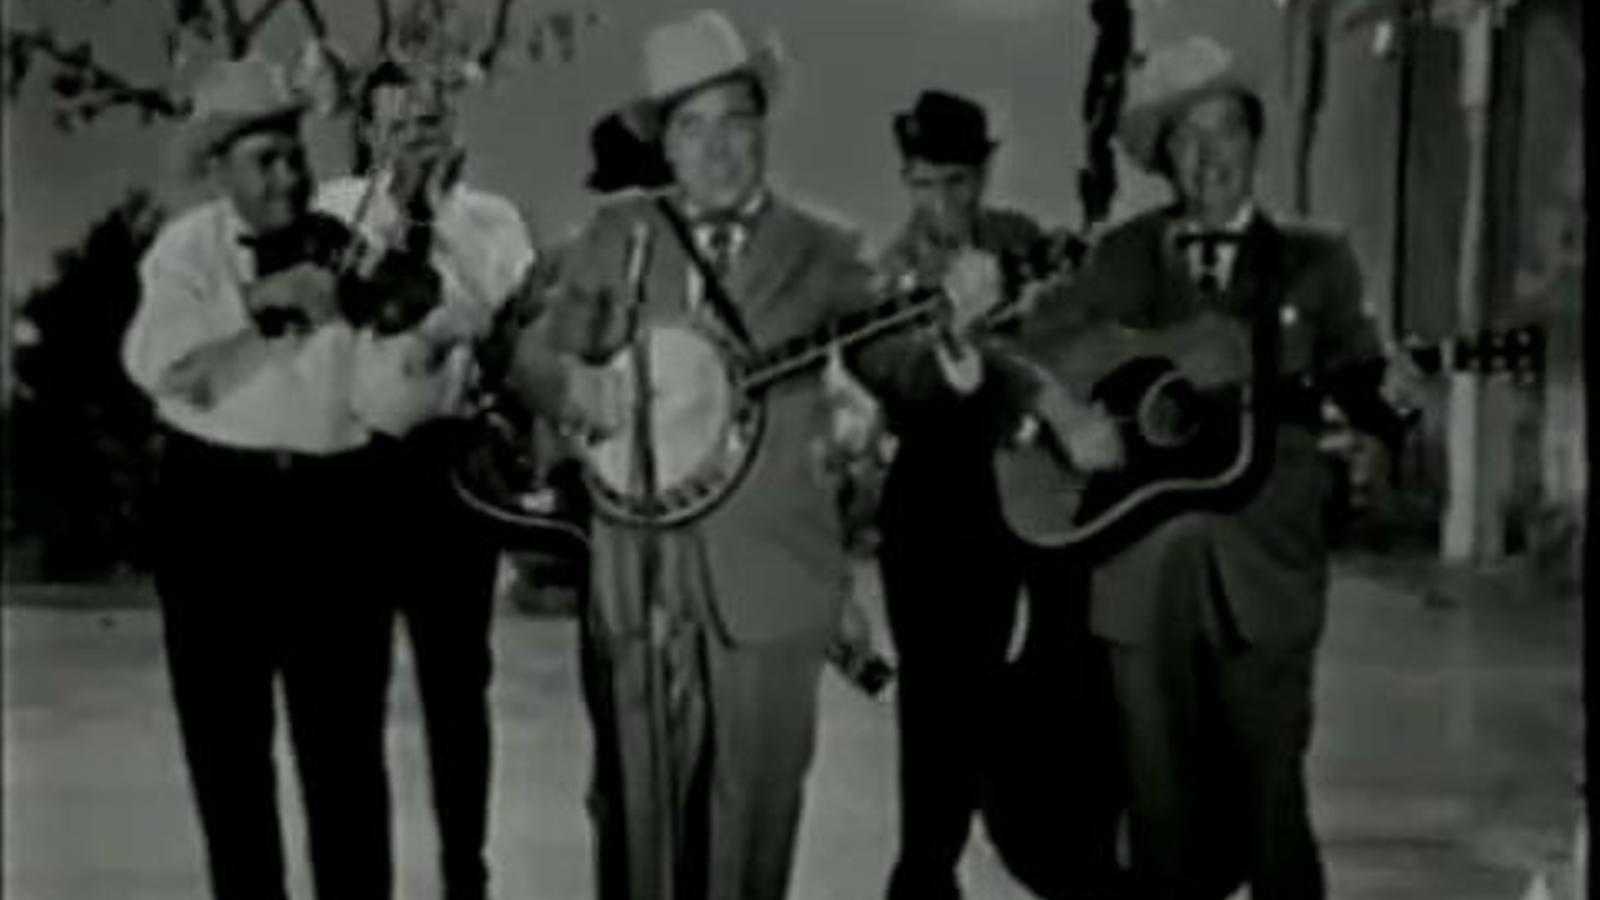 'Foggy Mountain Breakdown', d'Earl Scruggs, banda sonora de 'Bonnie and Clyde' (1967)